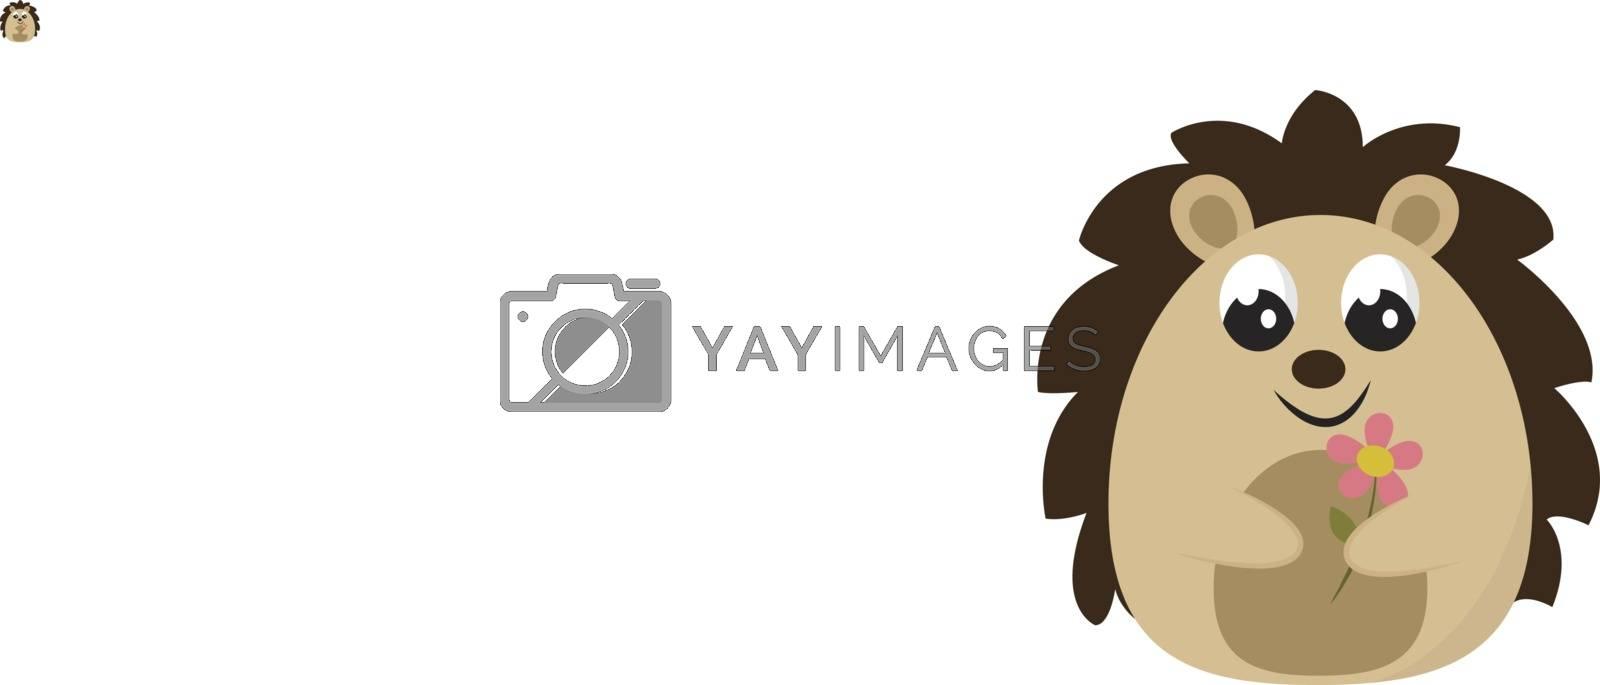 Happy hedgehog, illustration, vector on white background.